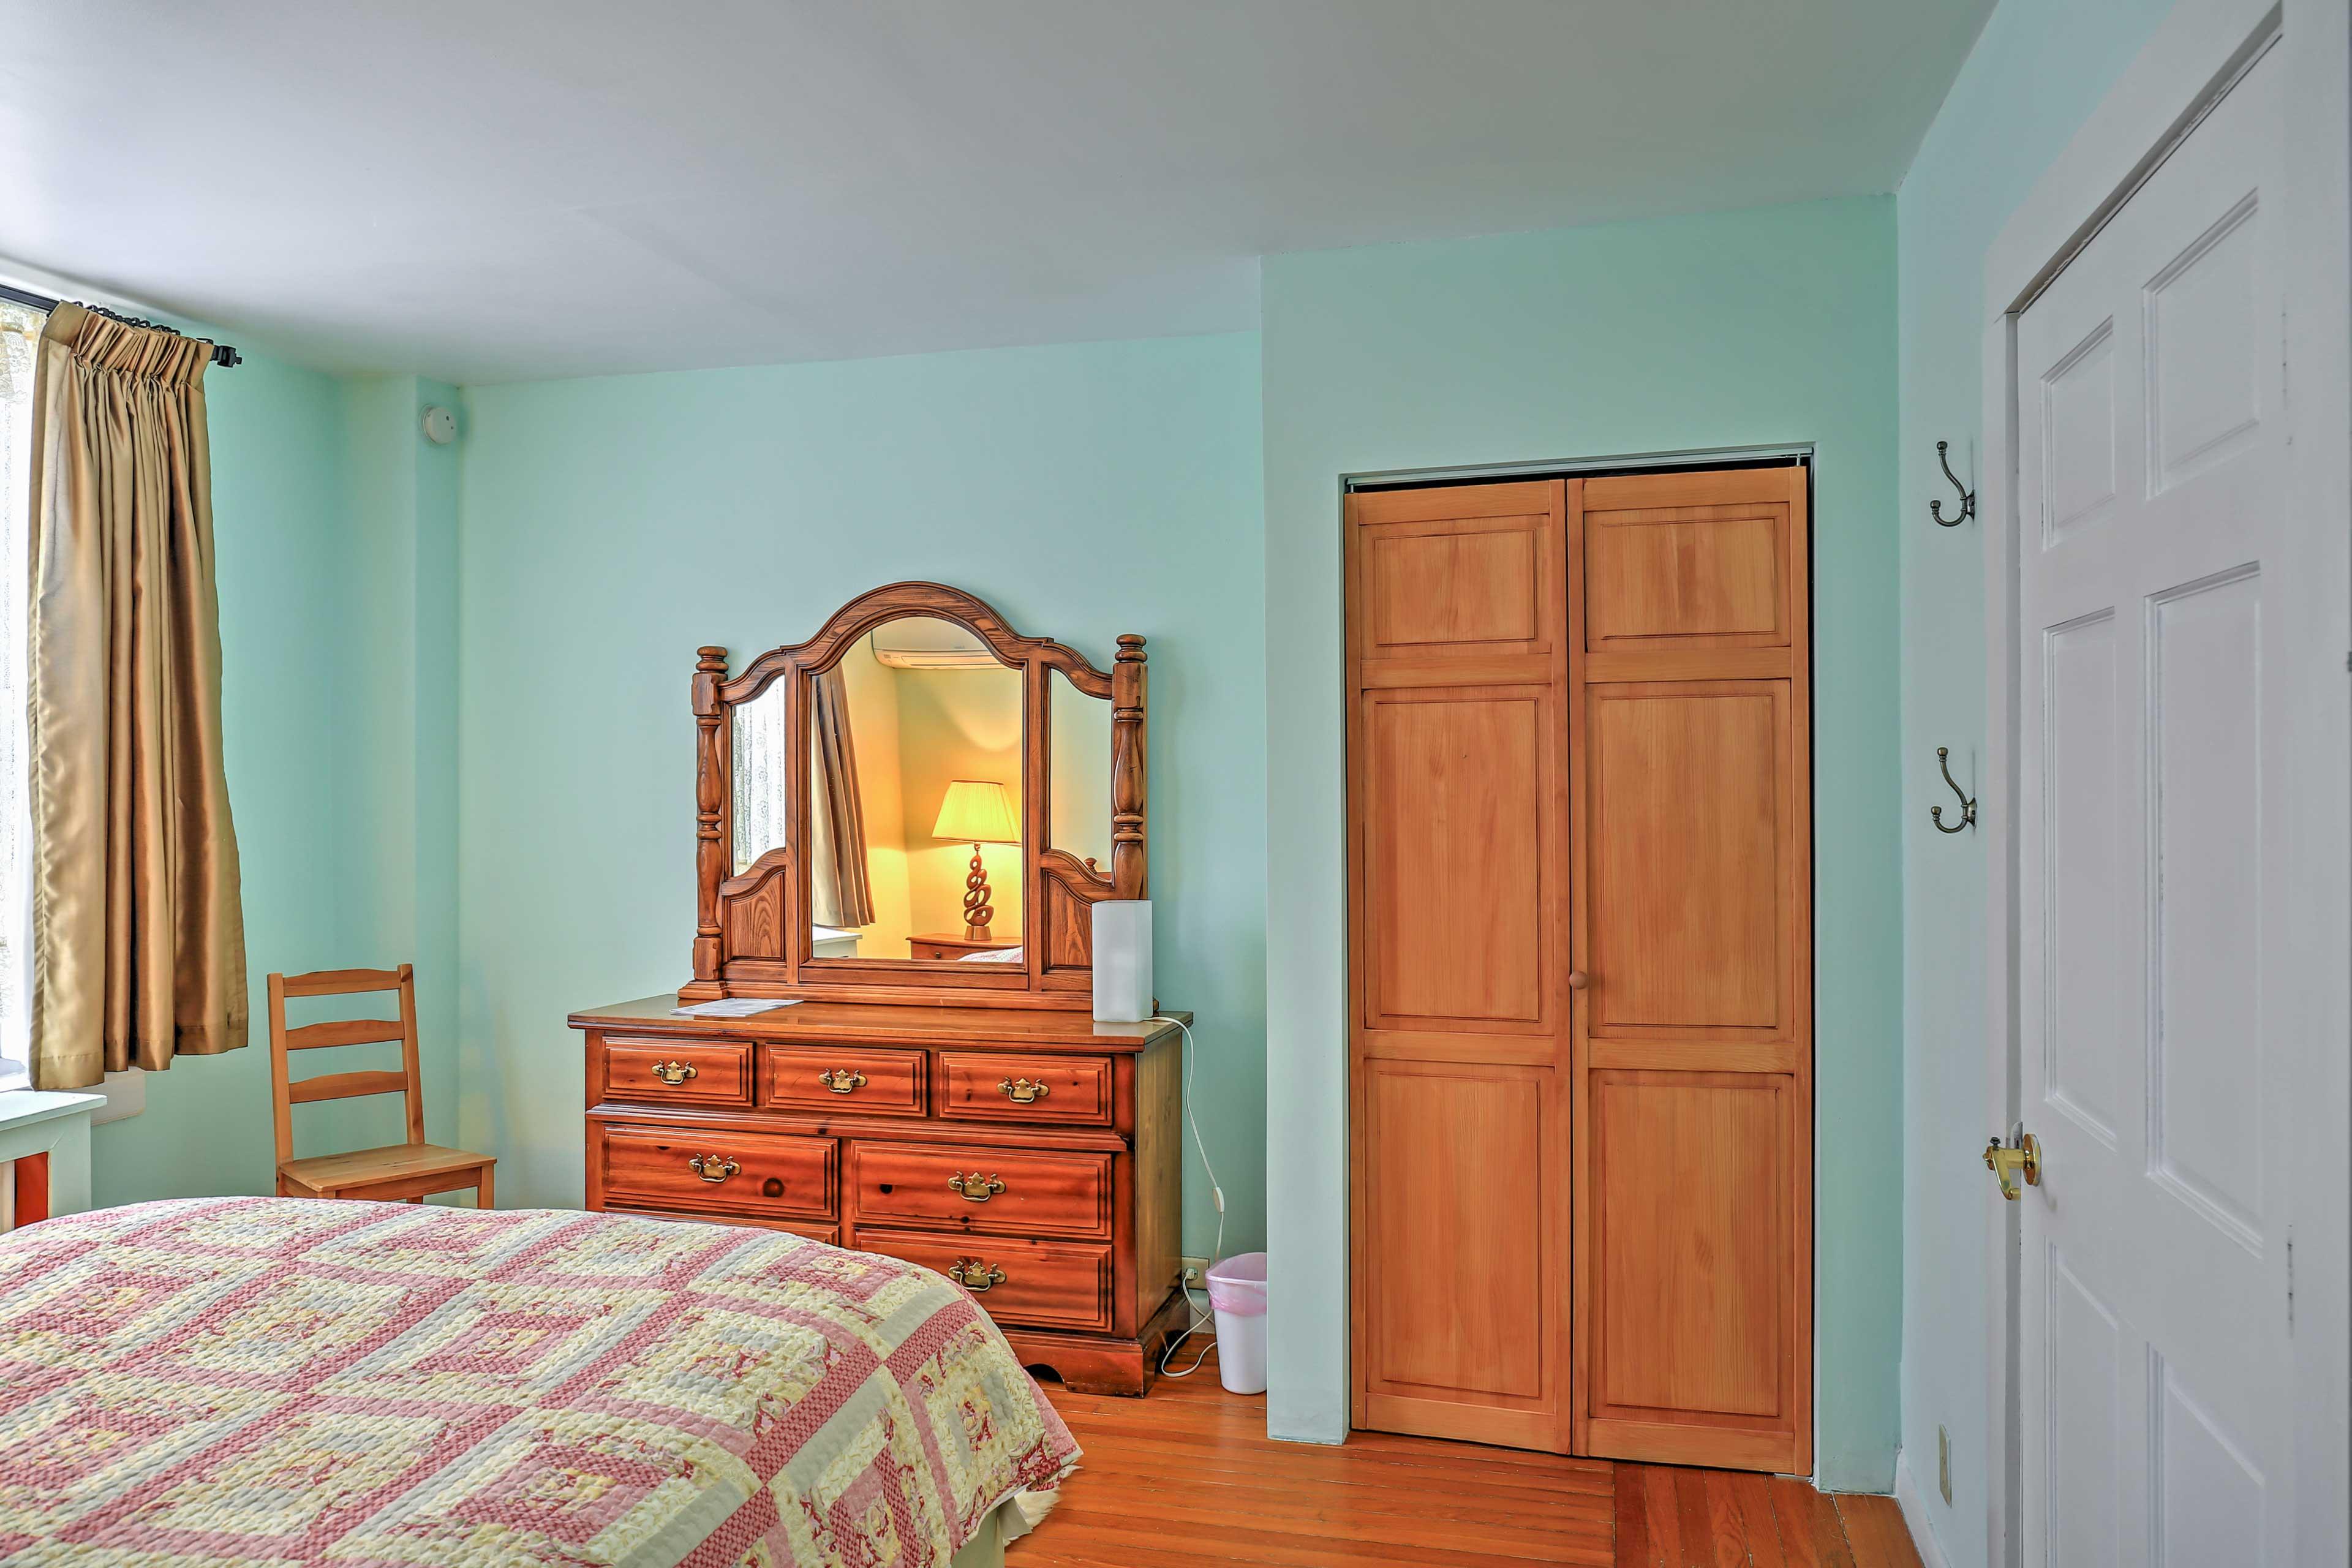 Wood furnishings adorn each room.